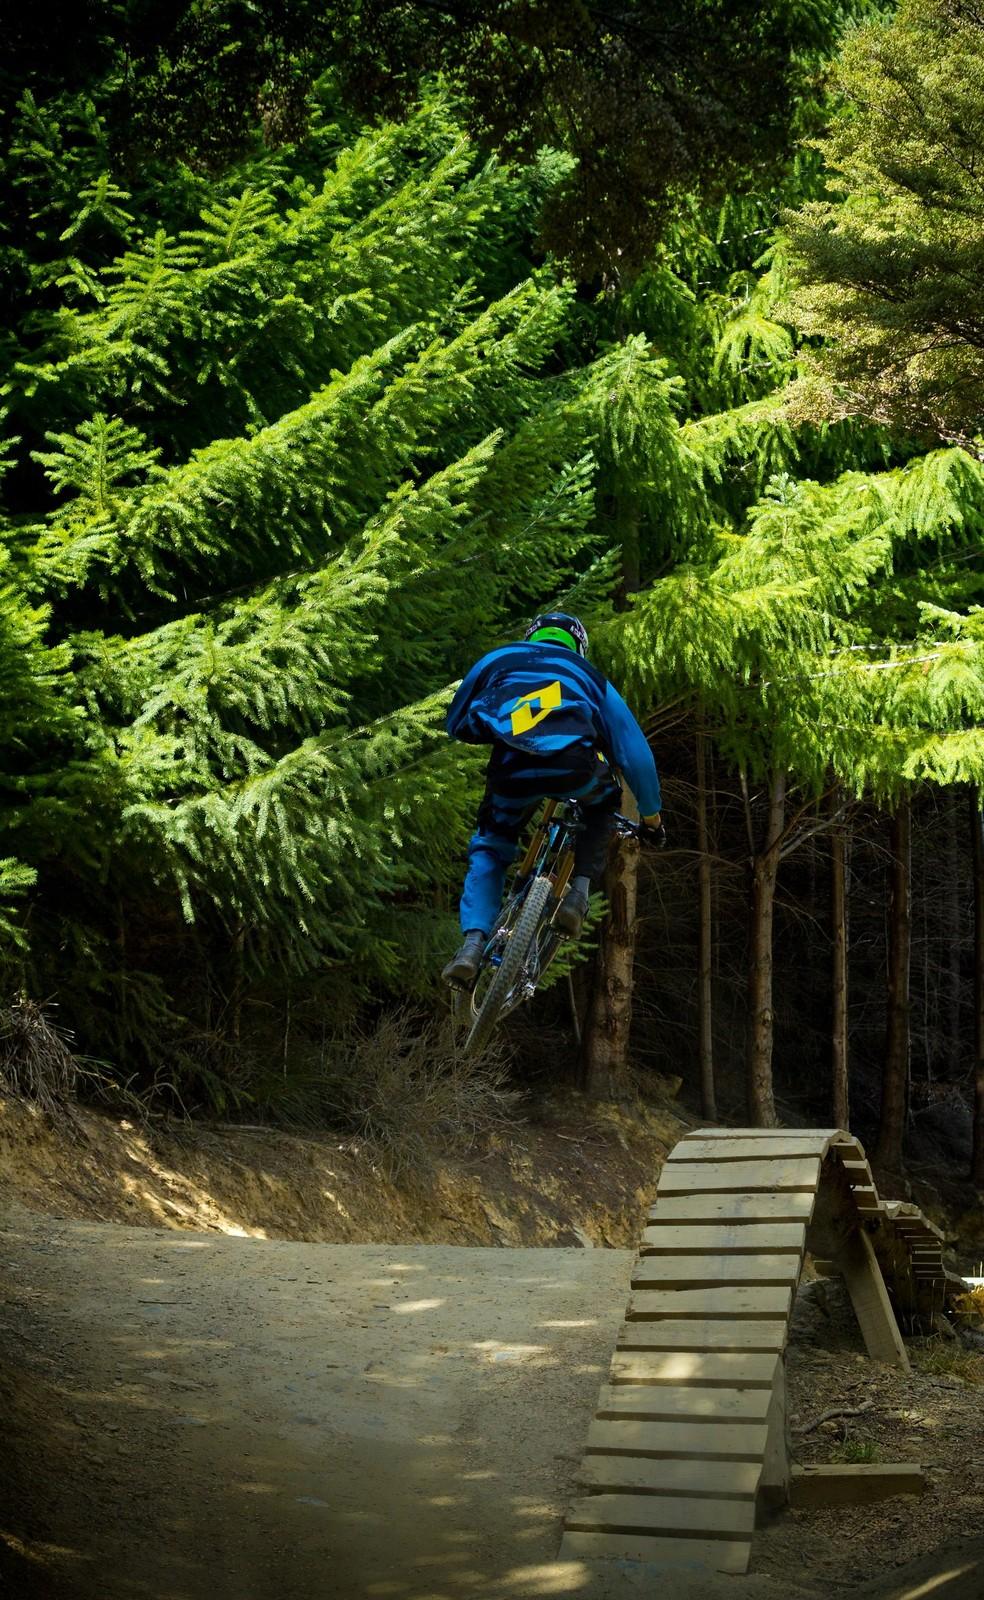 Hammies  Wood - Banditdh - Mountain Biking Pictures - Vital MTB